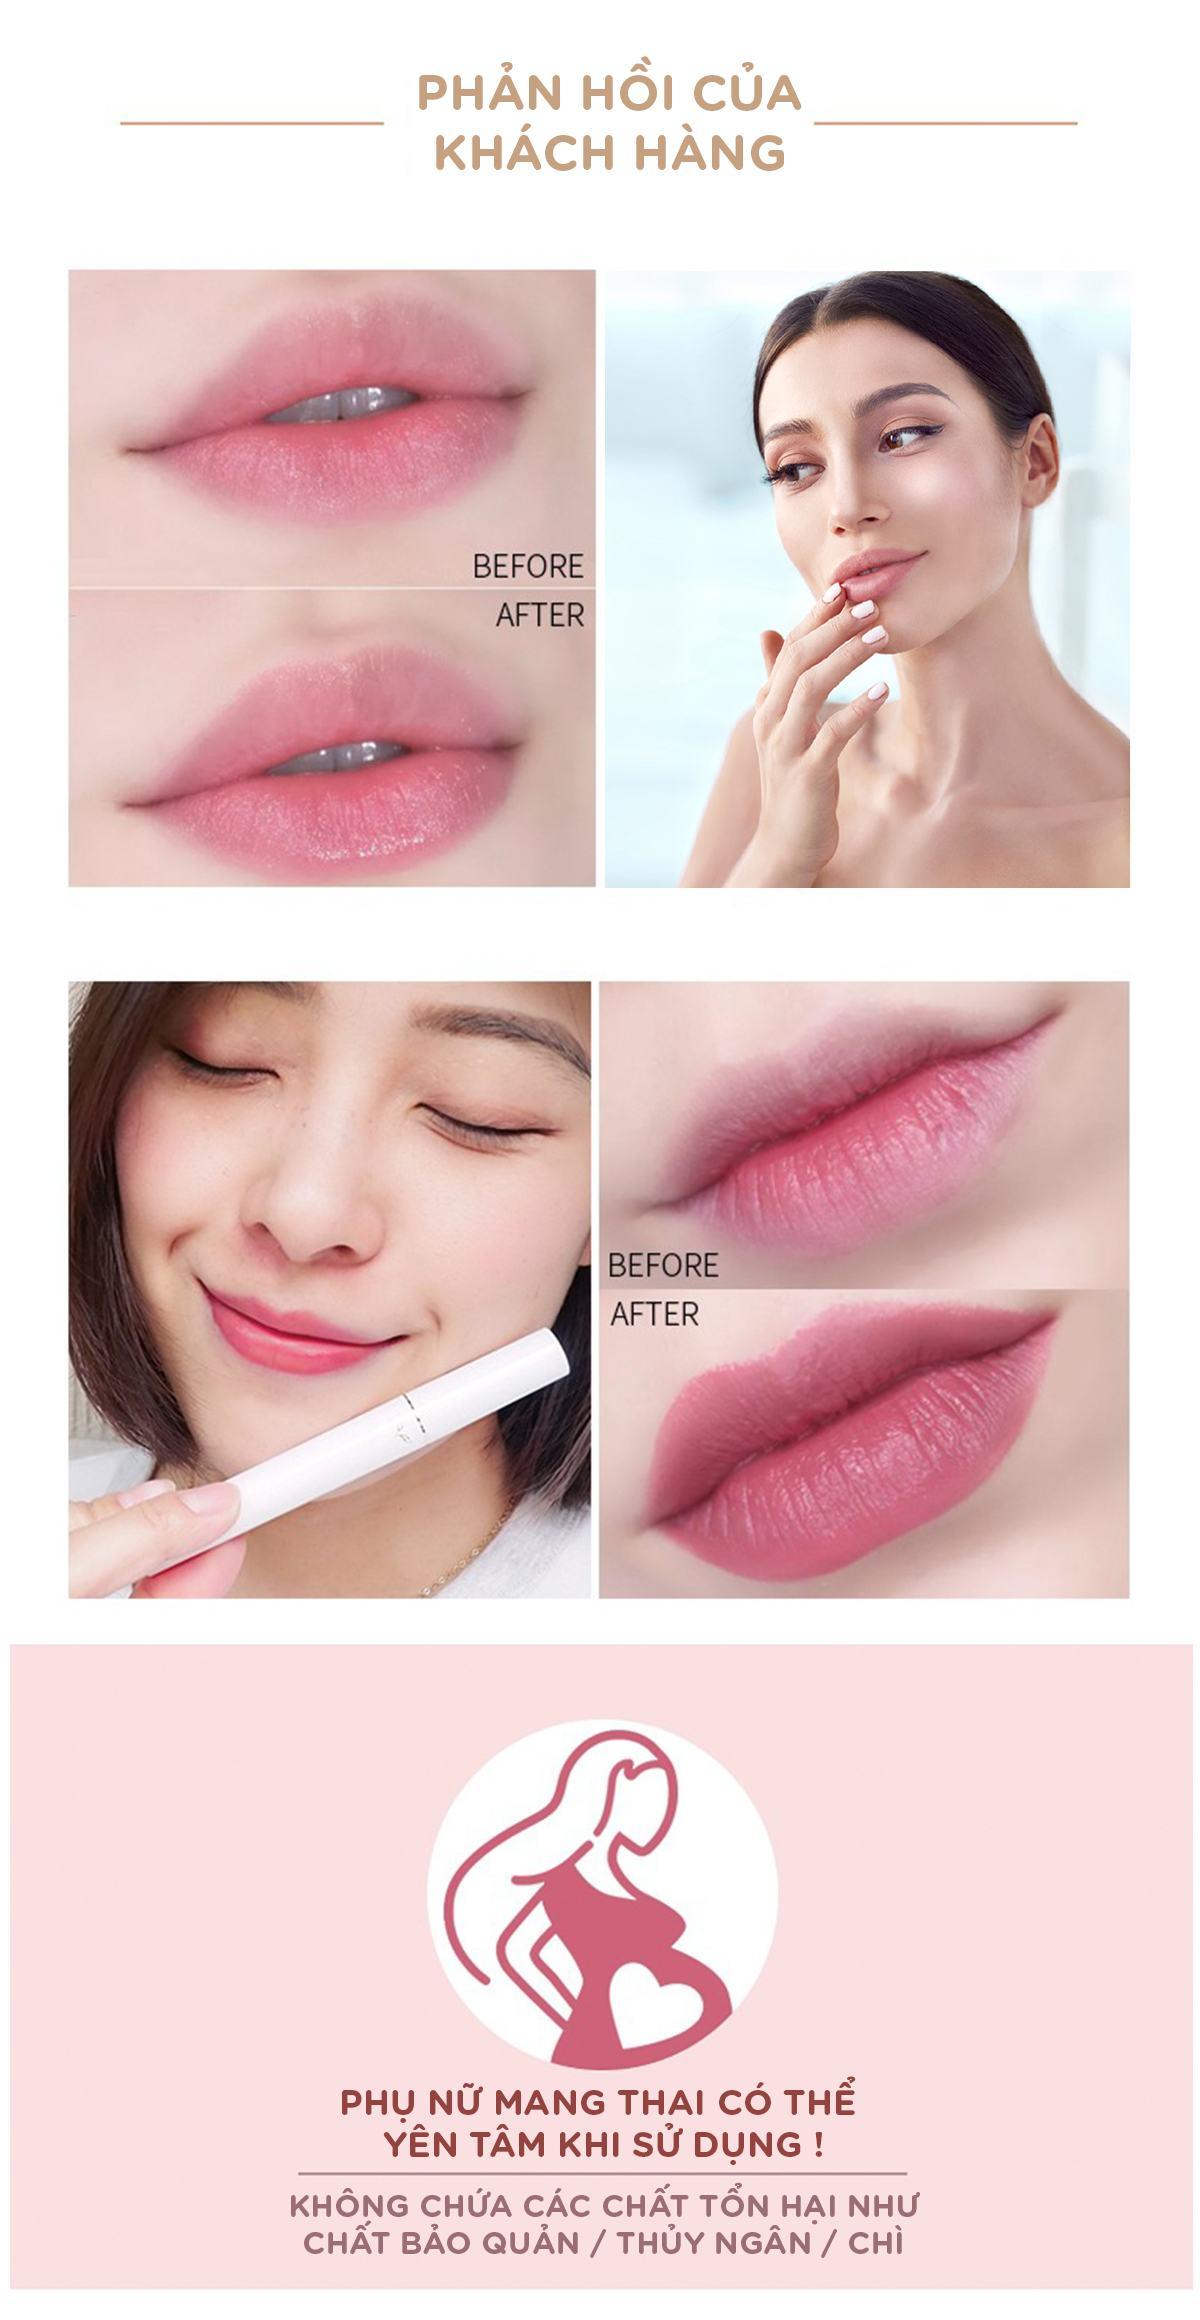 Đánh Giá Của Khách Về Son Gió Moisturizing Lipstick